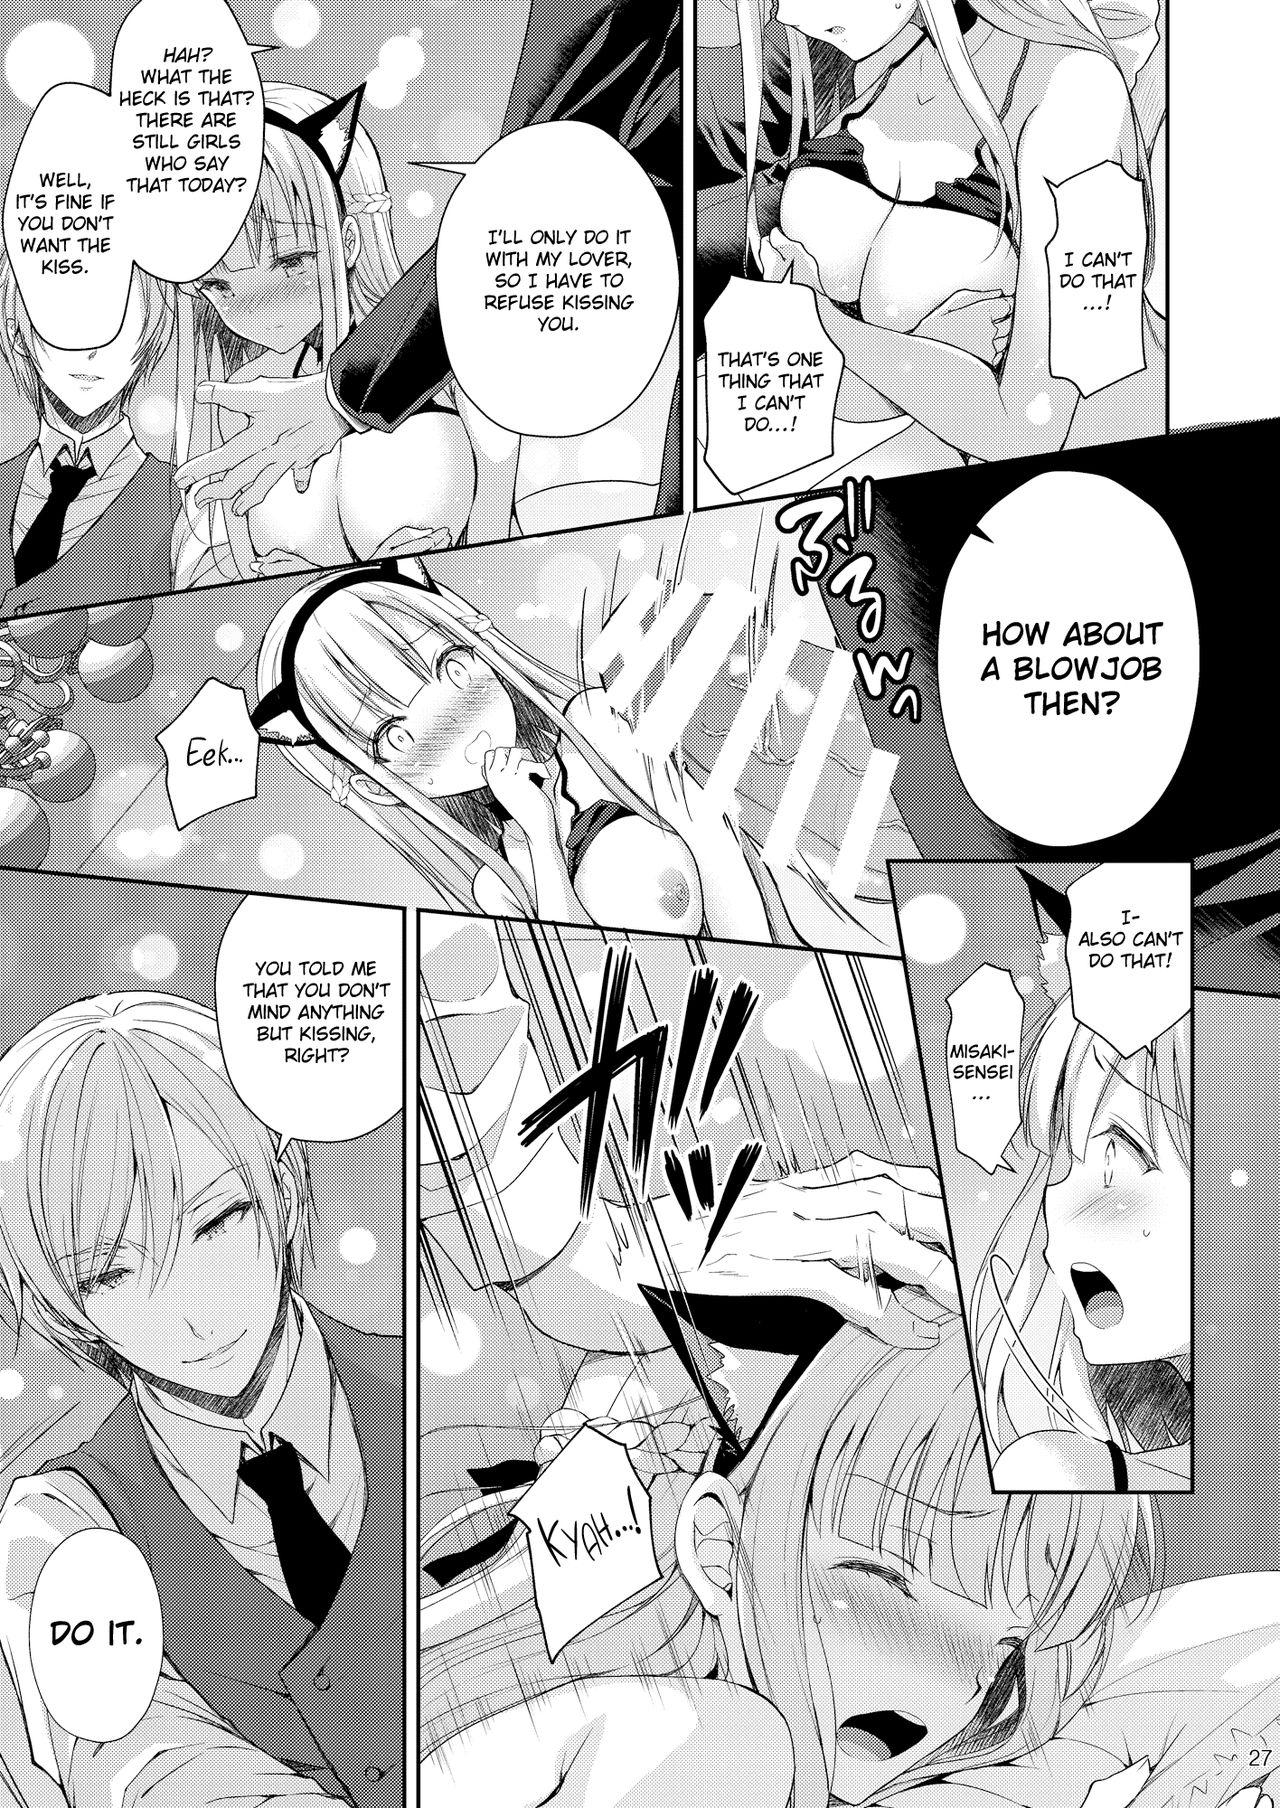 (C96) [Sugar*Berry*Syrup (Crowe)] Indeki no Reijou 3 ~Yureugoku Kokoro, Yoru Midareru Mitsubana~ | Obscene Lady 3 - ~Wavering heart, Astrayed Evening Nectar~ [English] [obsoletezero] 26